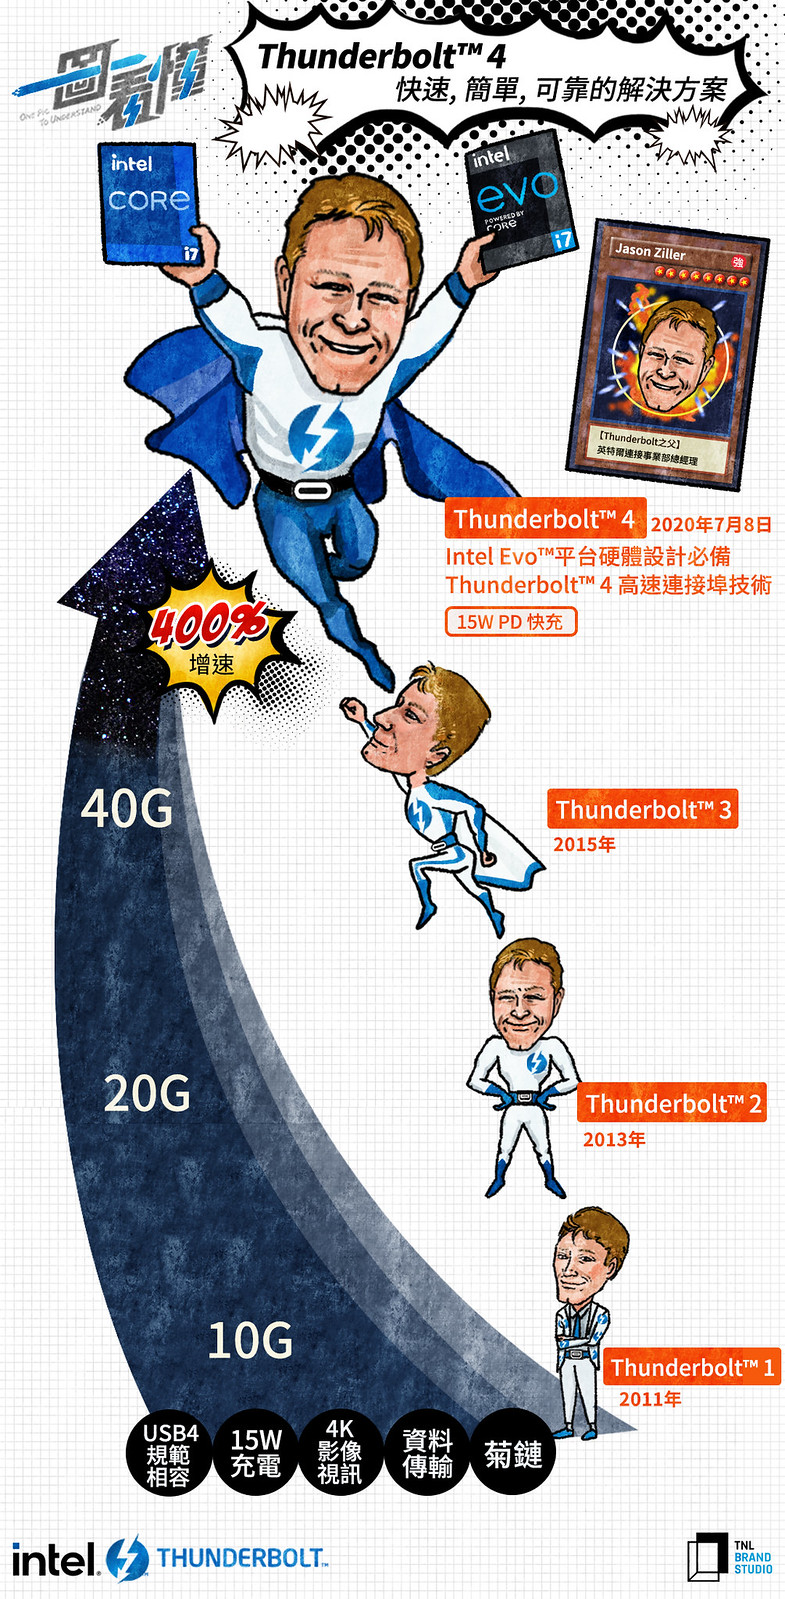 【Intel】Thunderbolt X Cool3c_一圖看懂_繁中